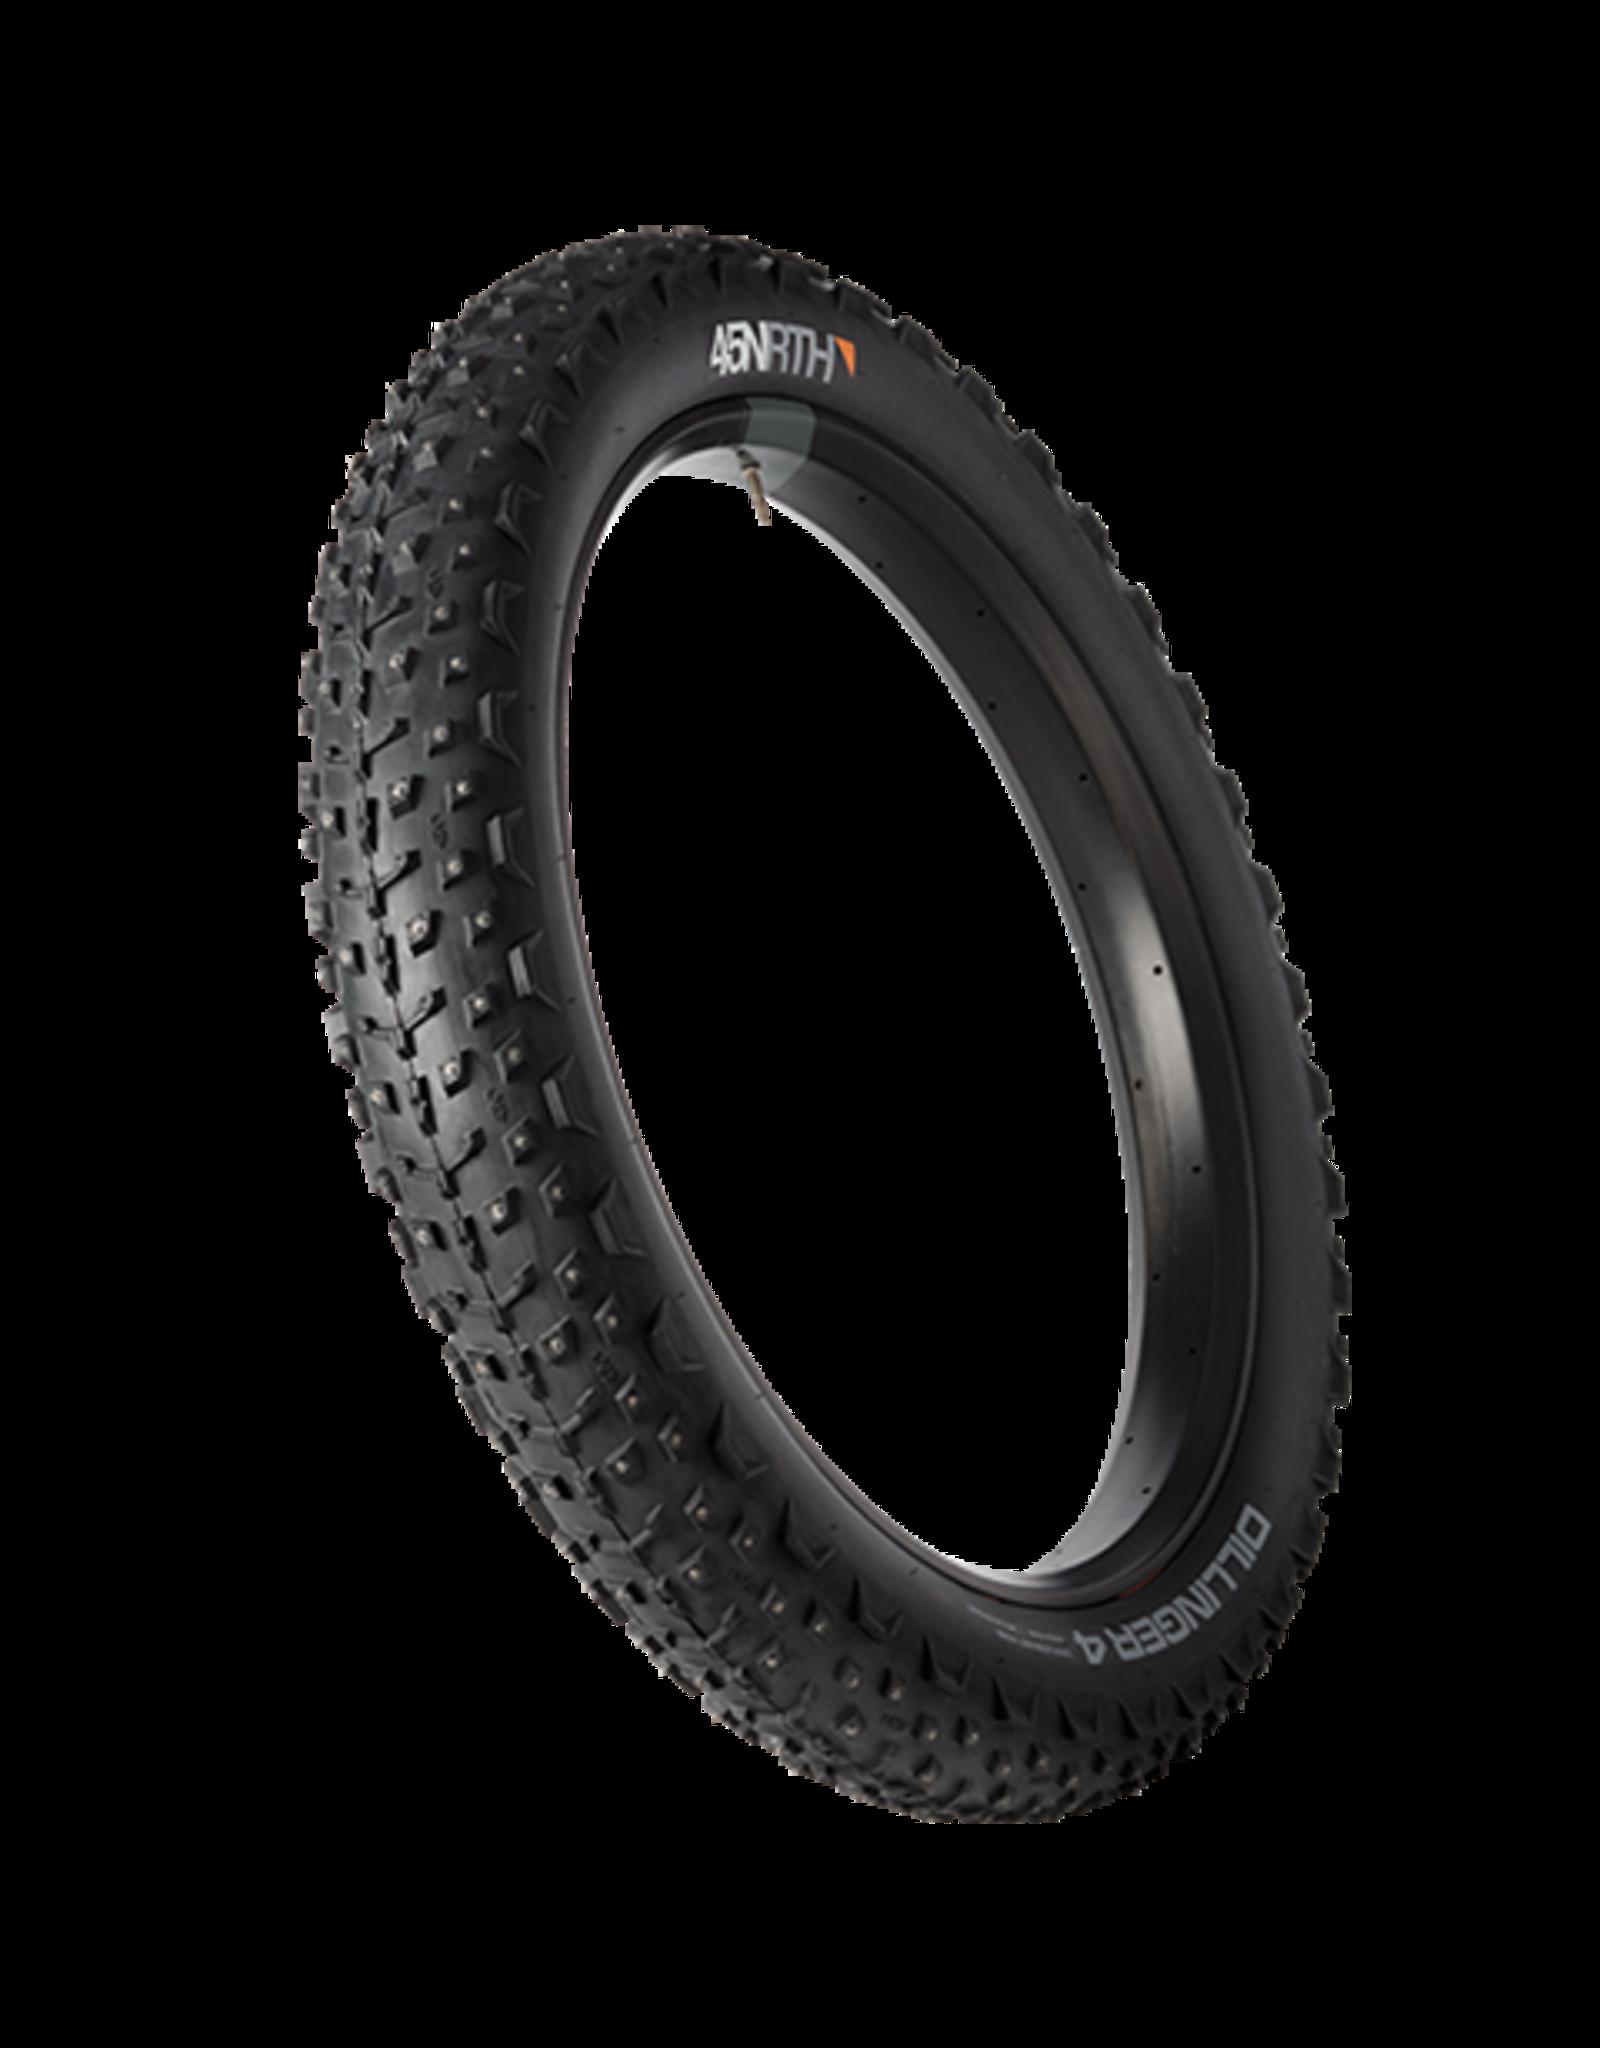 45NRTH 27.5x4.0 45 Dillinger 4 NRTH Tire, TR, Fold, Black, 120tpi, 252 Concave Carbide Aluminum Studs